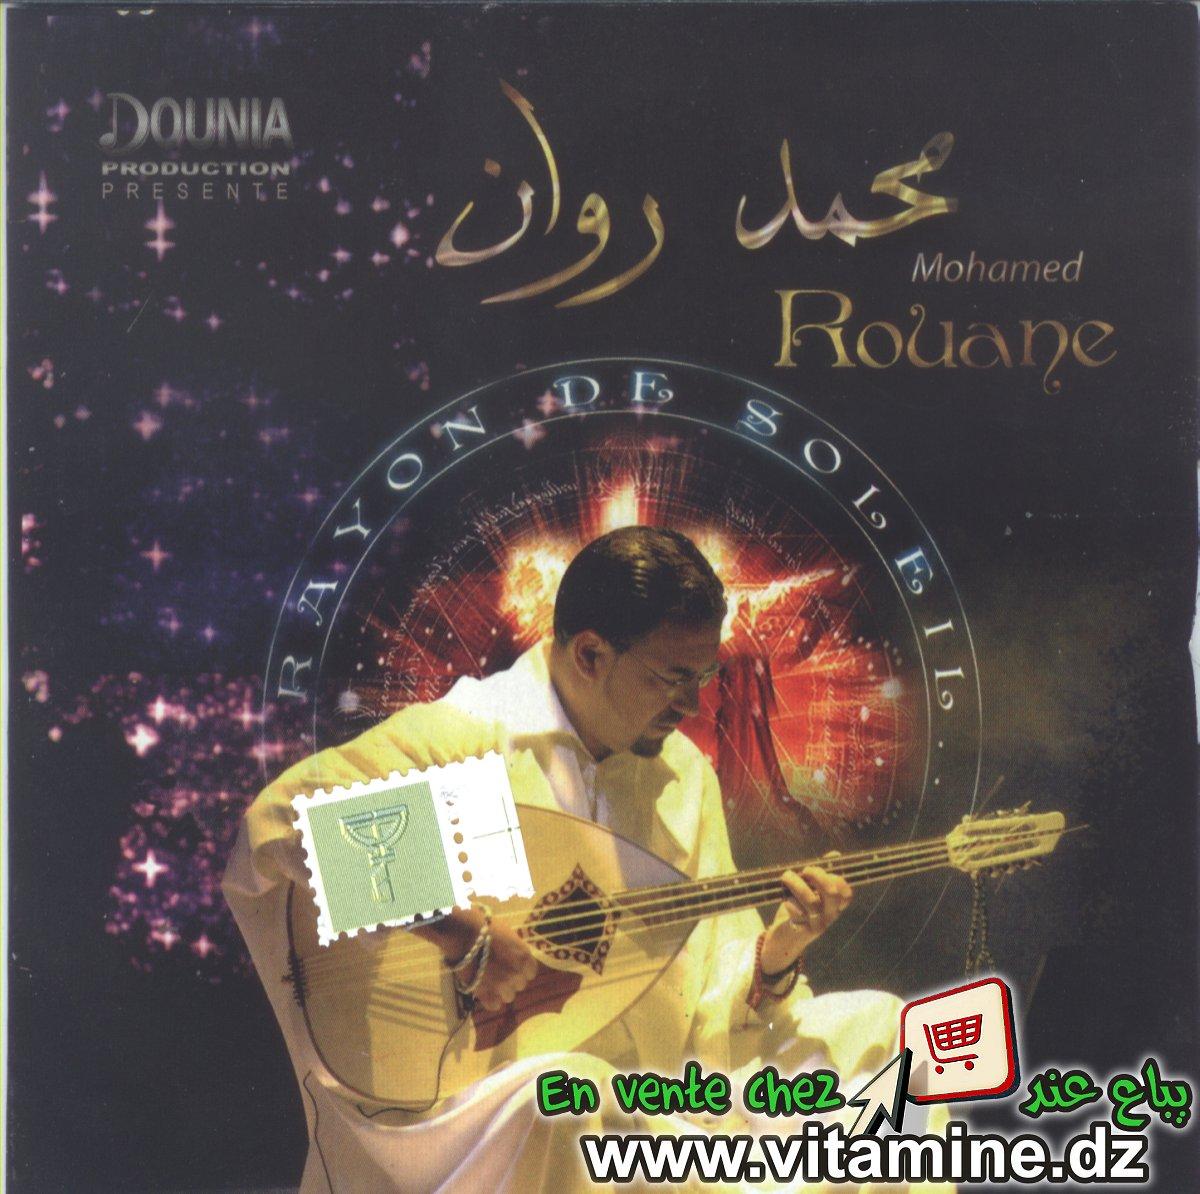 Mohamed Rouane - Rayon de soleil